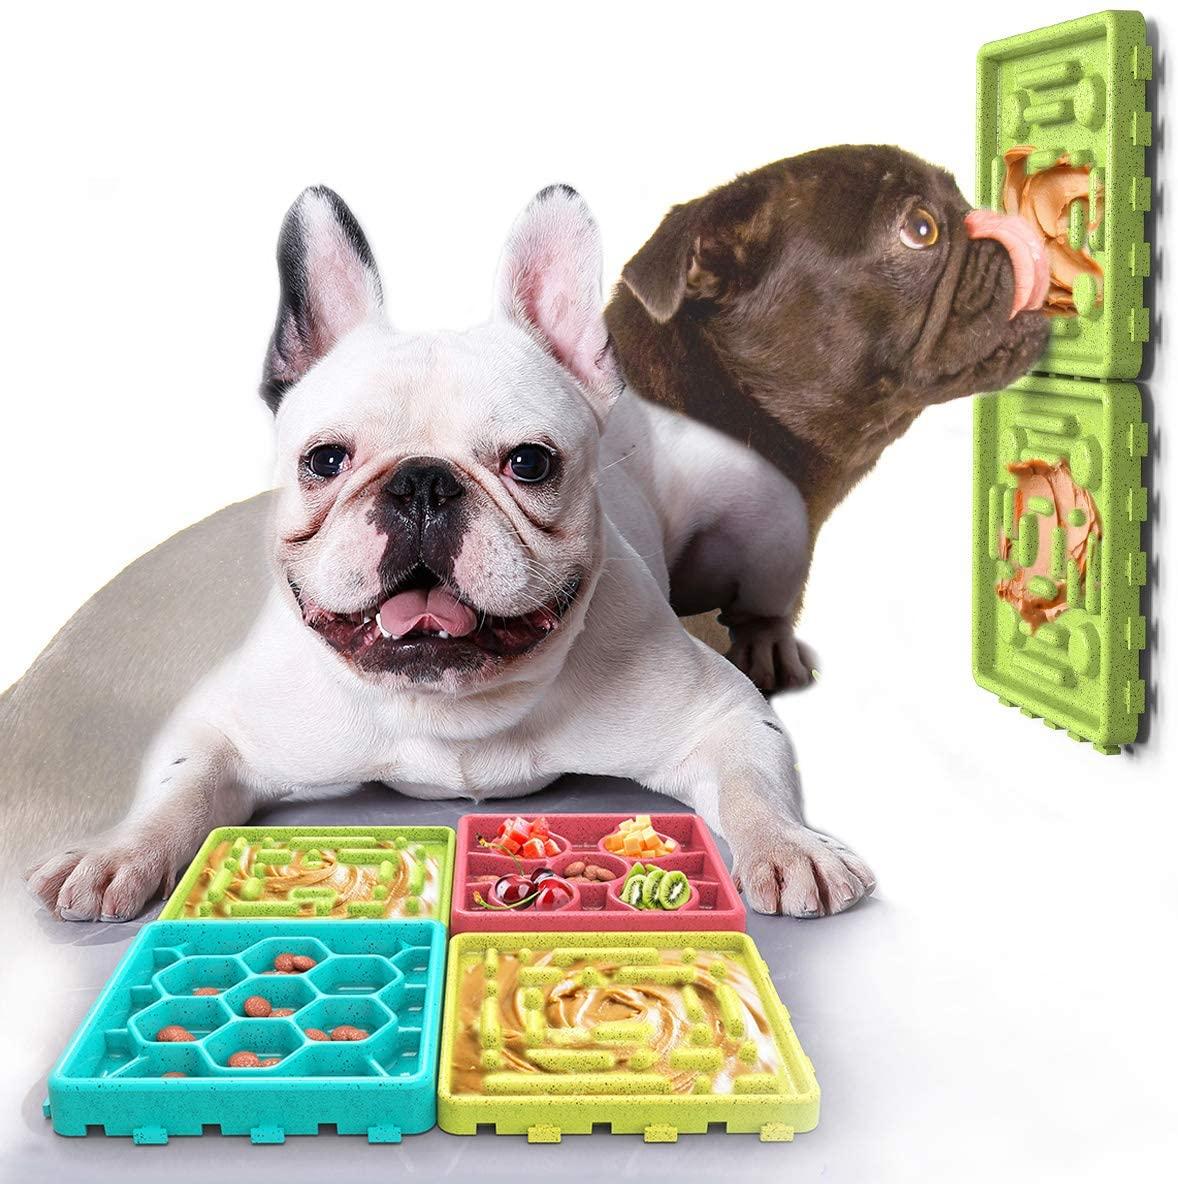 SH-RuiDu 4pcs Slow Feeder Dog Food Tray Pet Lick Pad Non-Slip Bottom Slow Treat Dispensing Mat Colorful